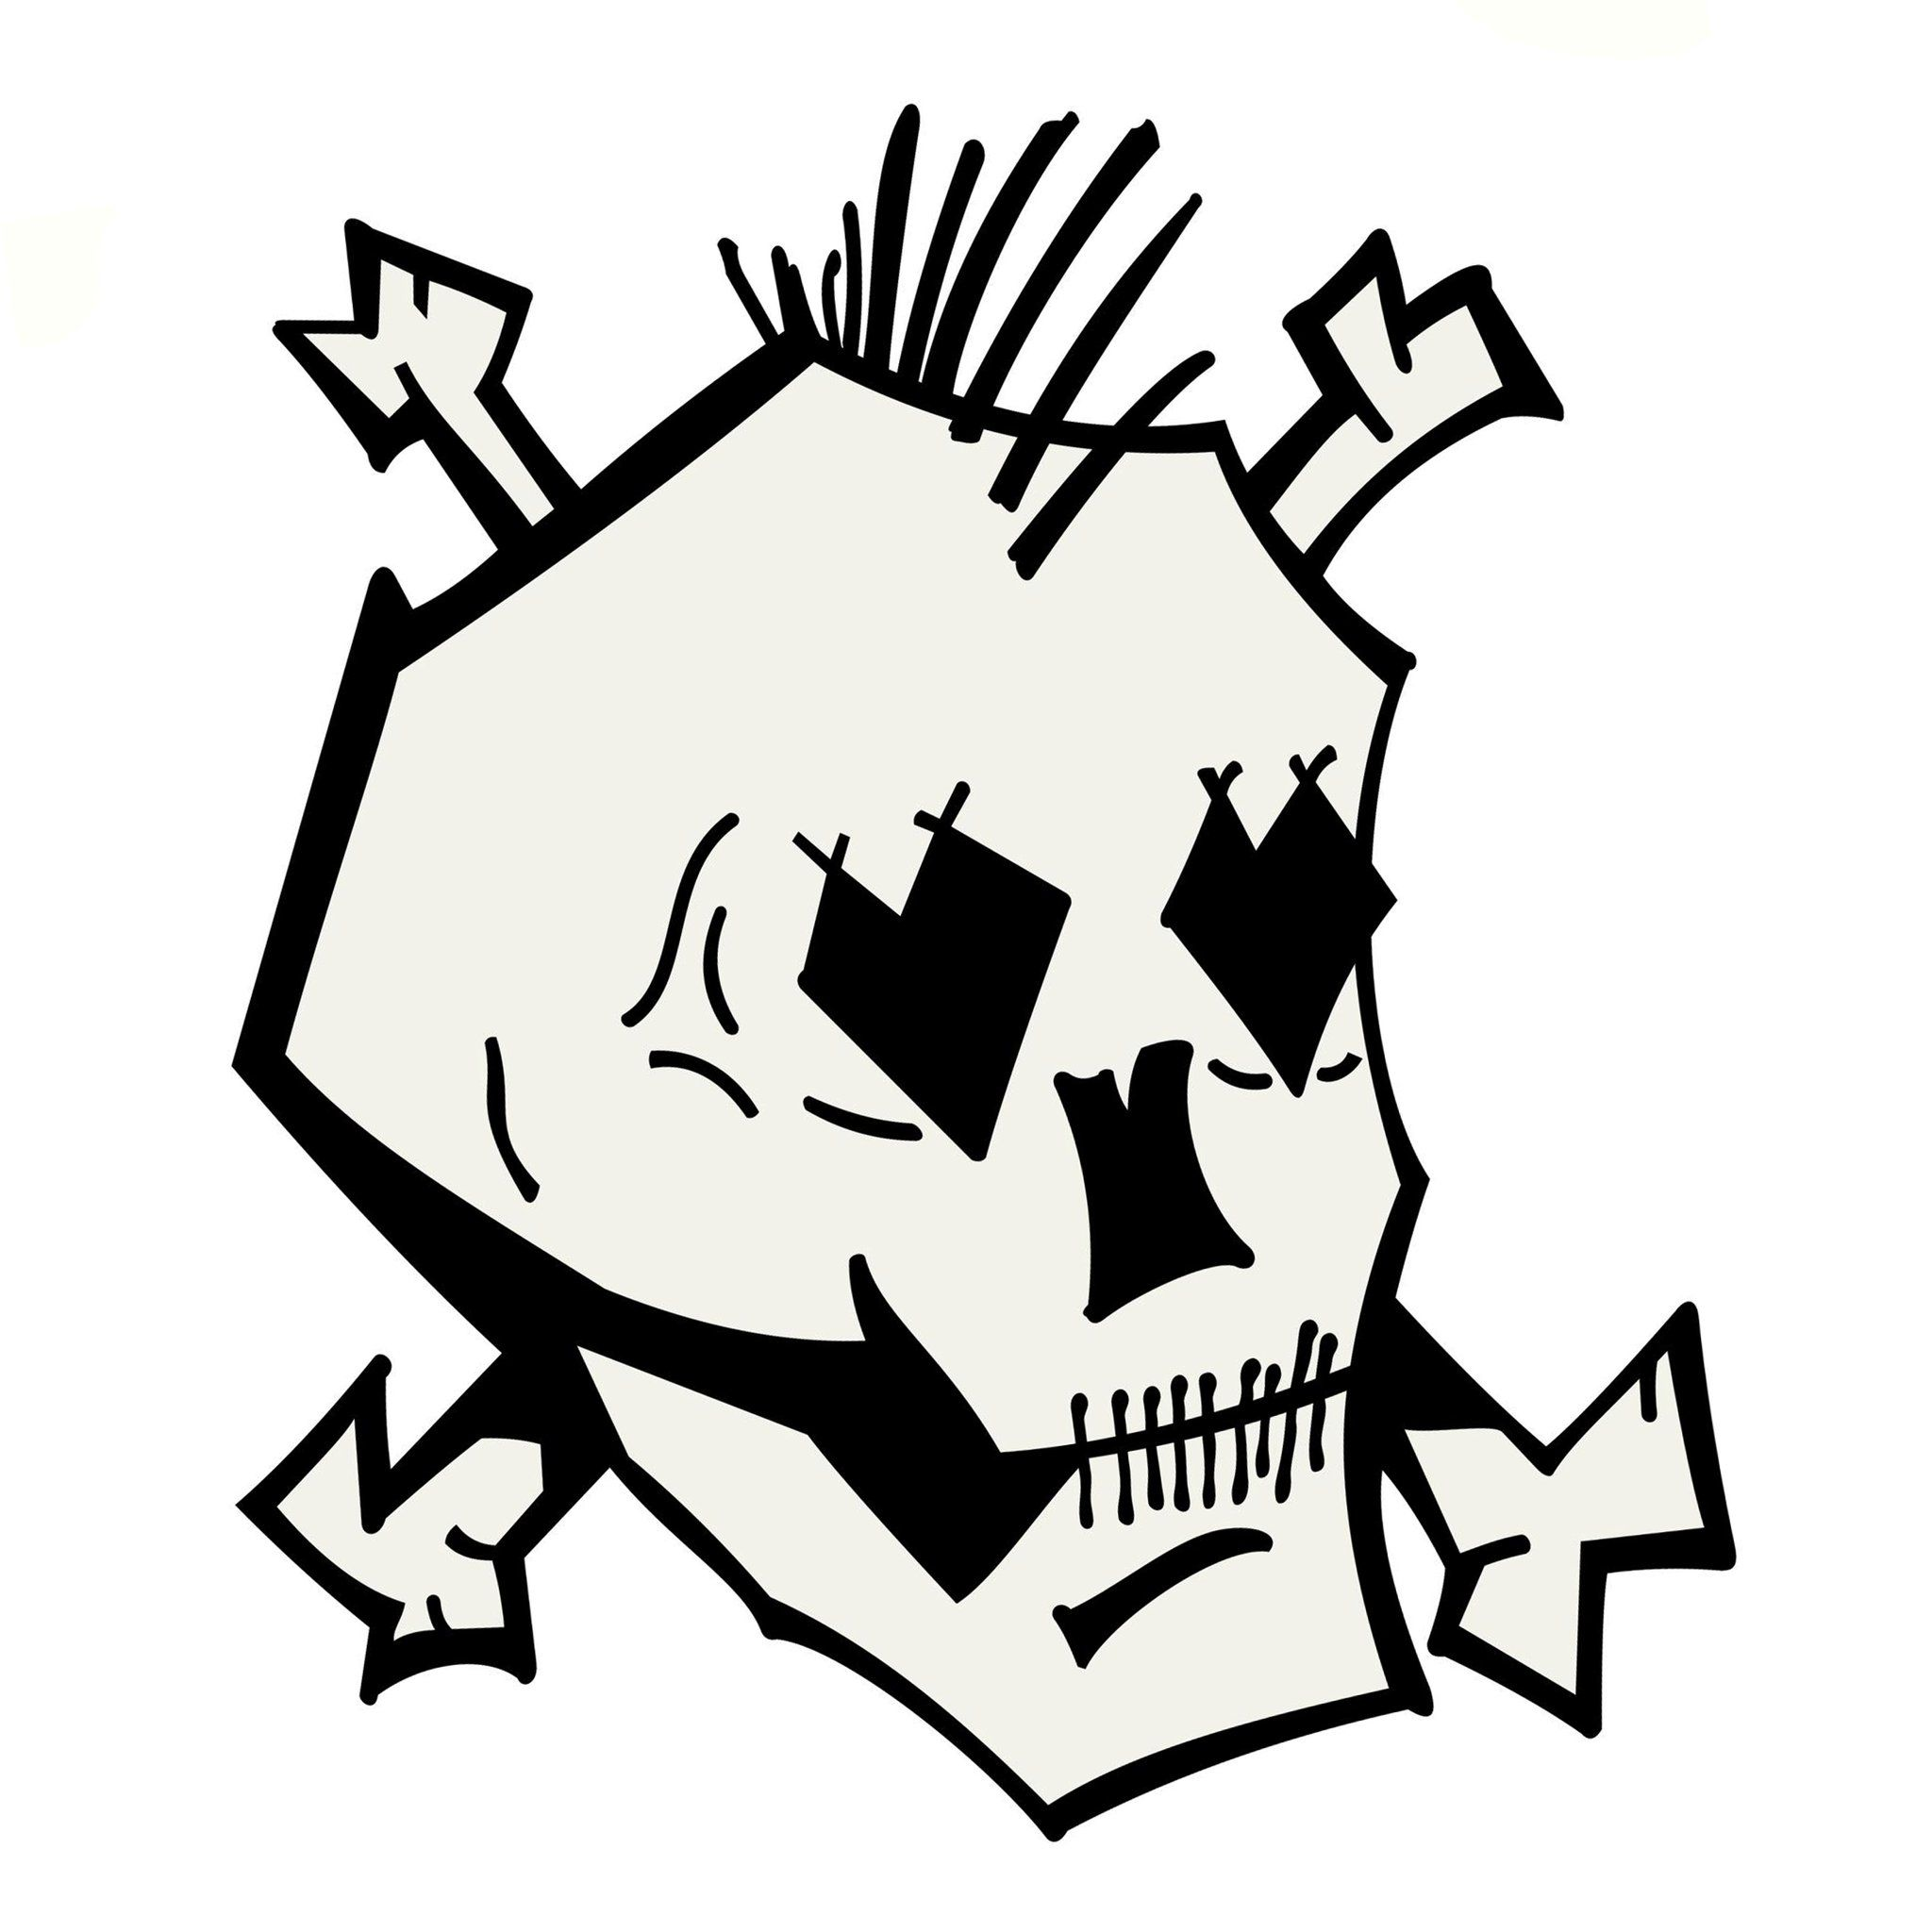 Brutally Frank Losbadguys Punkabilly Psychobilly Psychobilly Punk Music Joplin